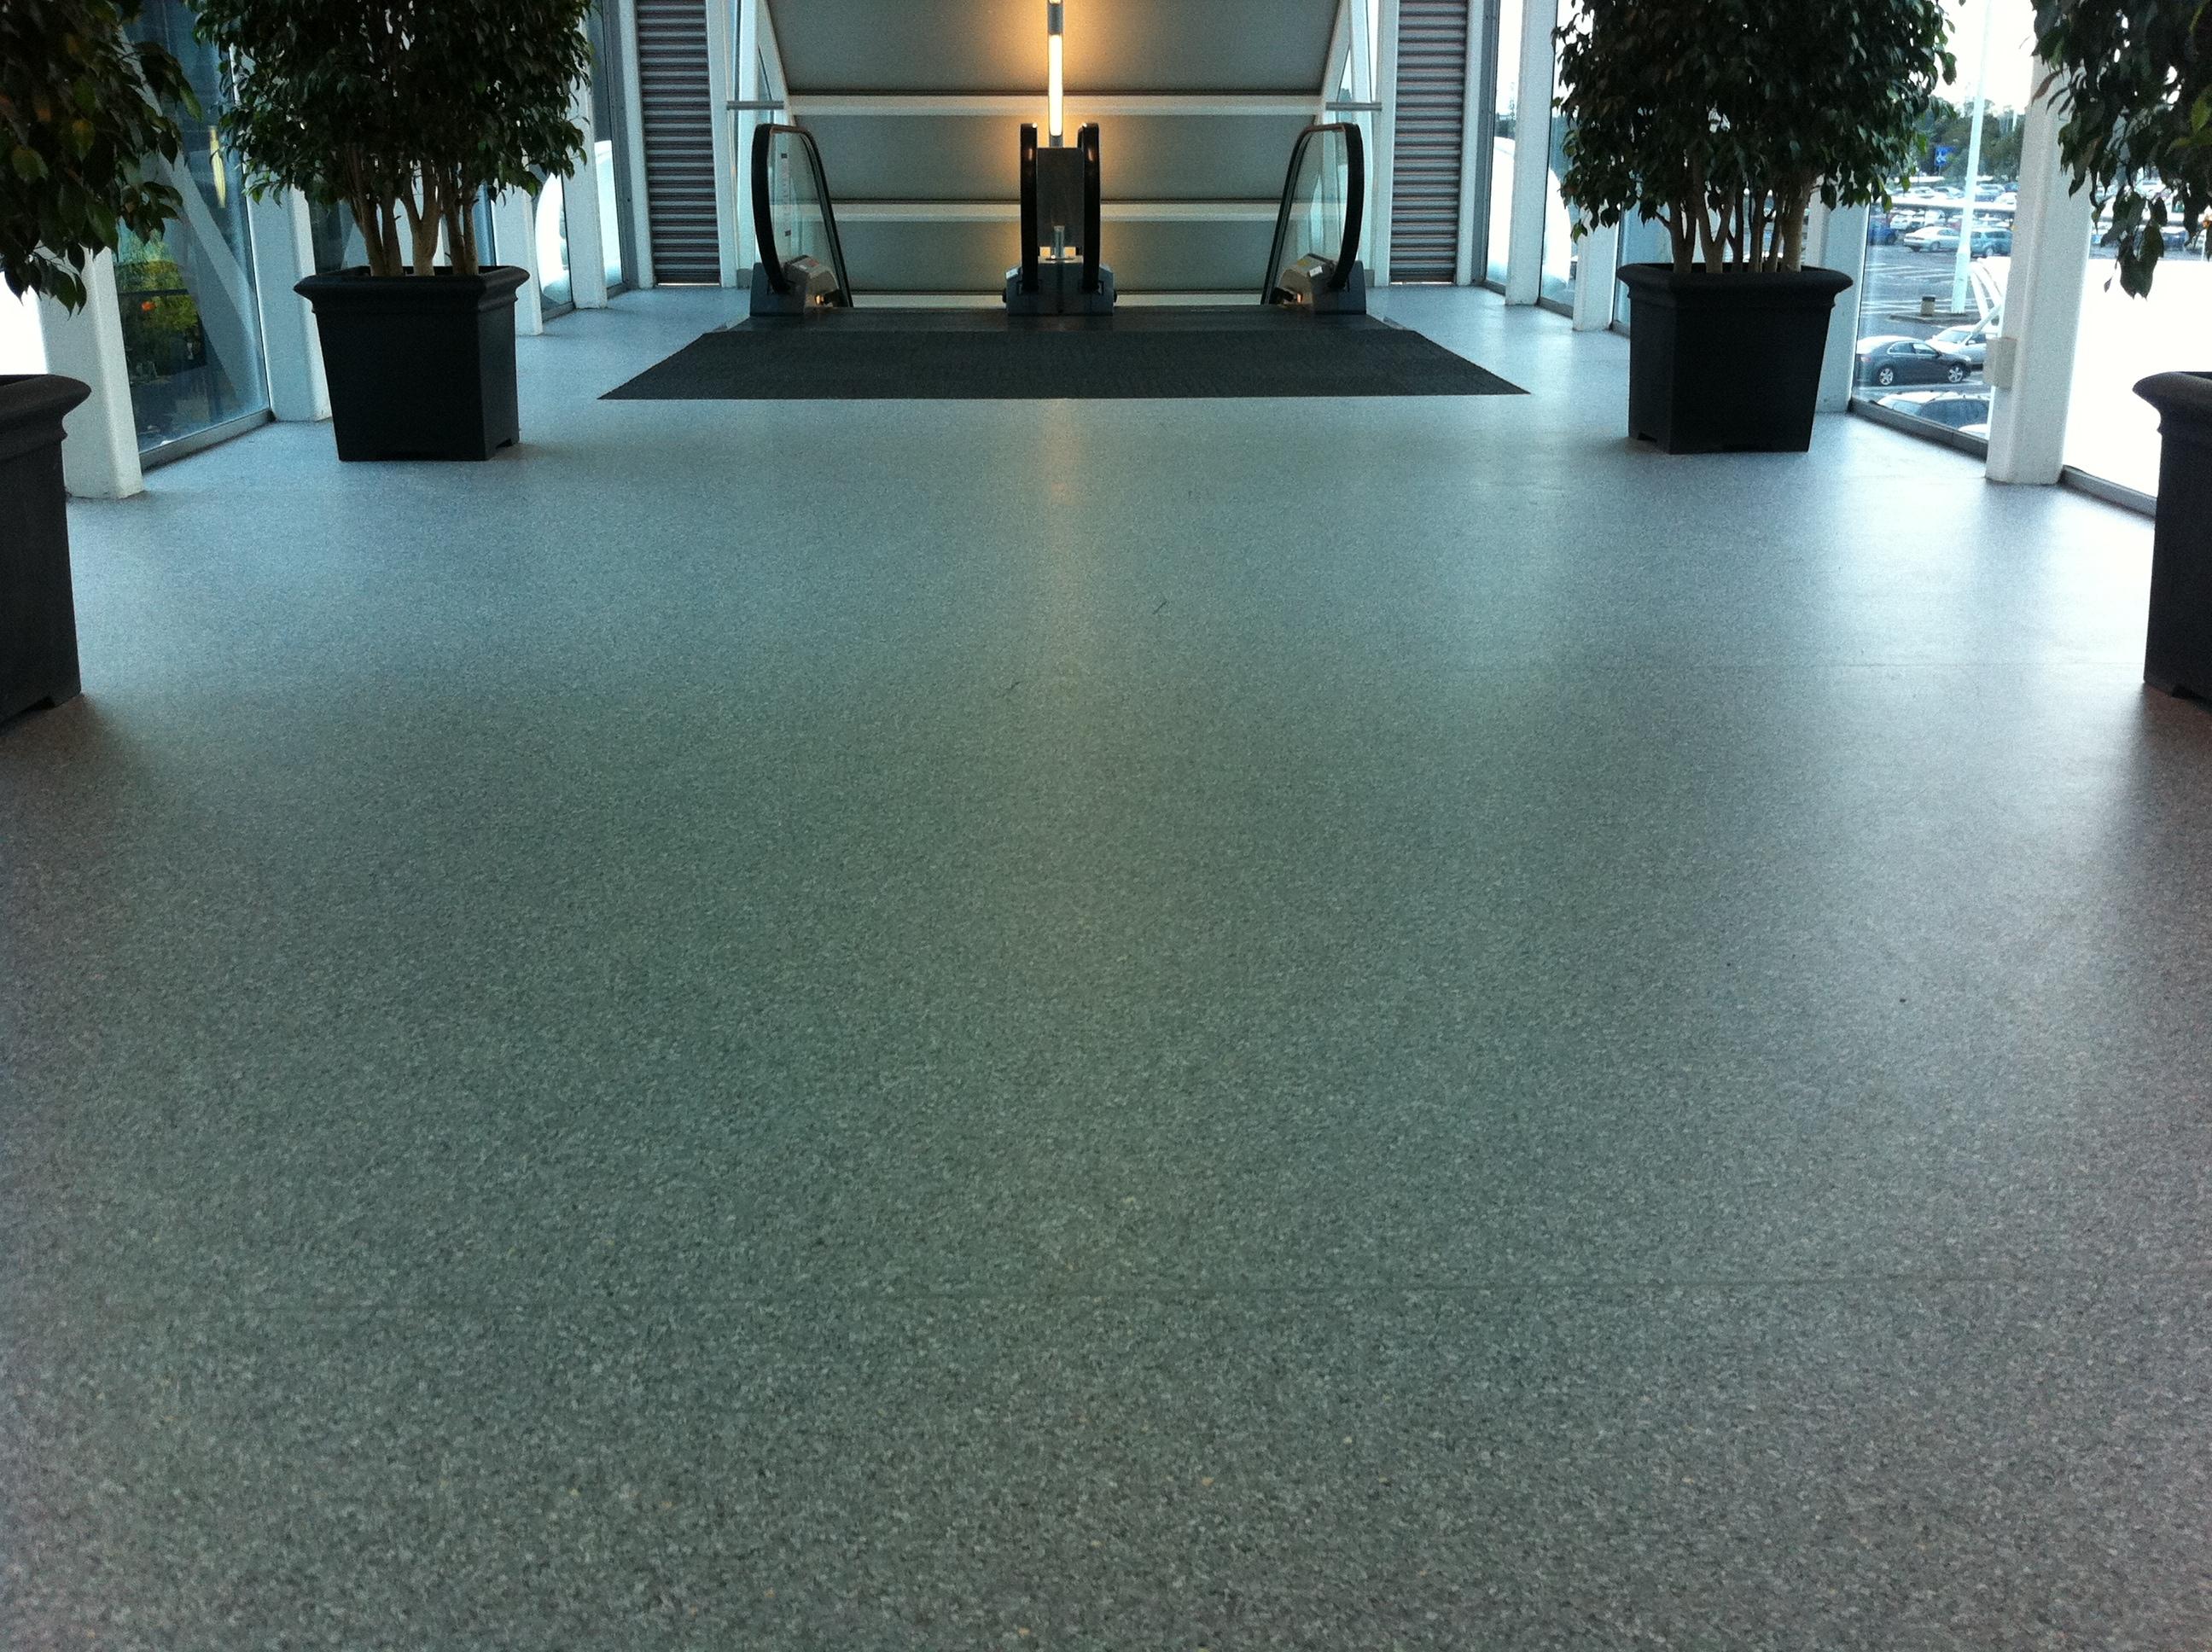 Designer commercial vinyl flooring